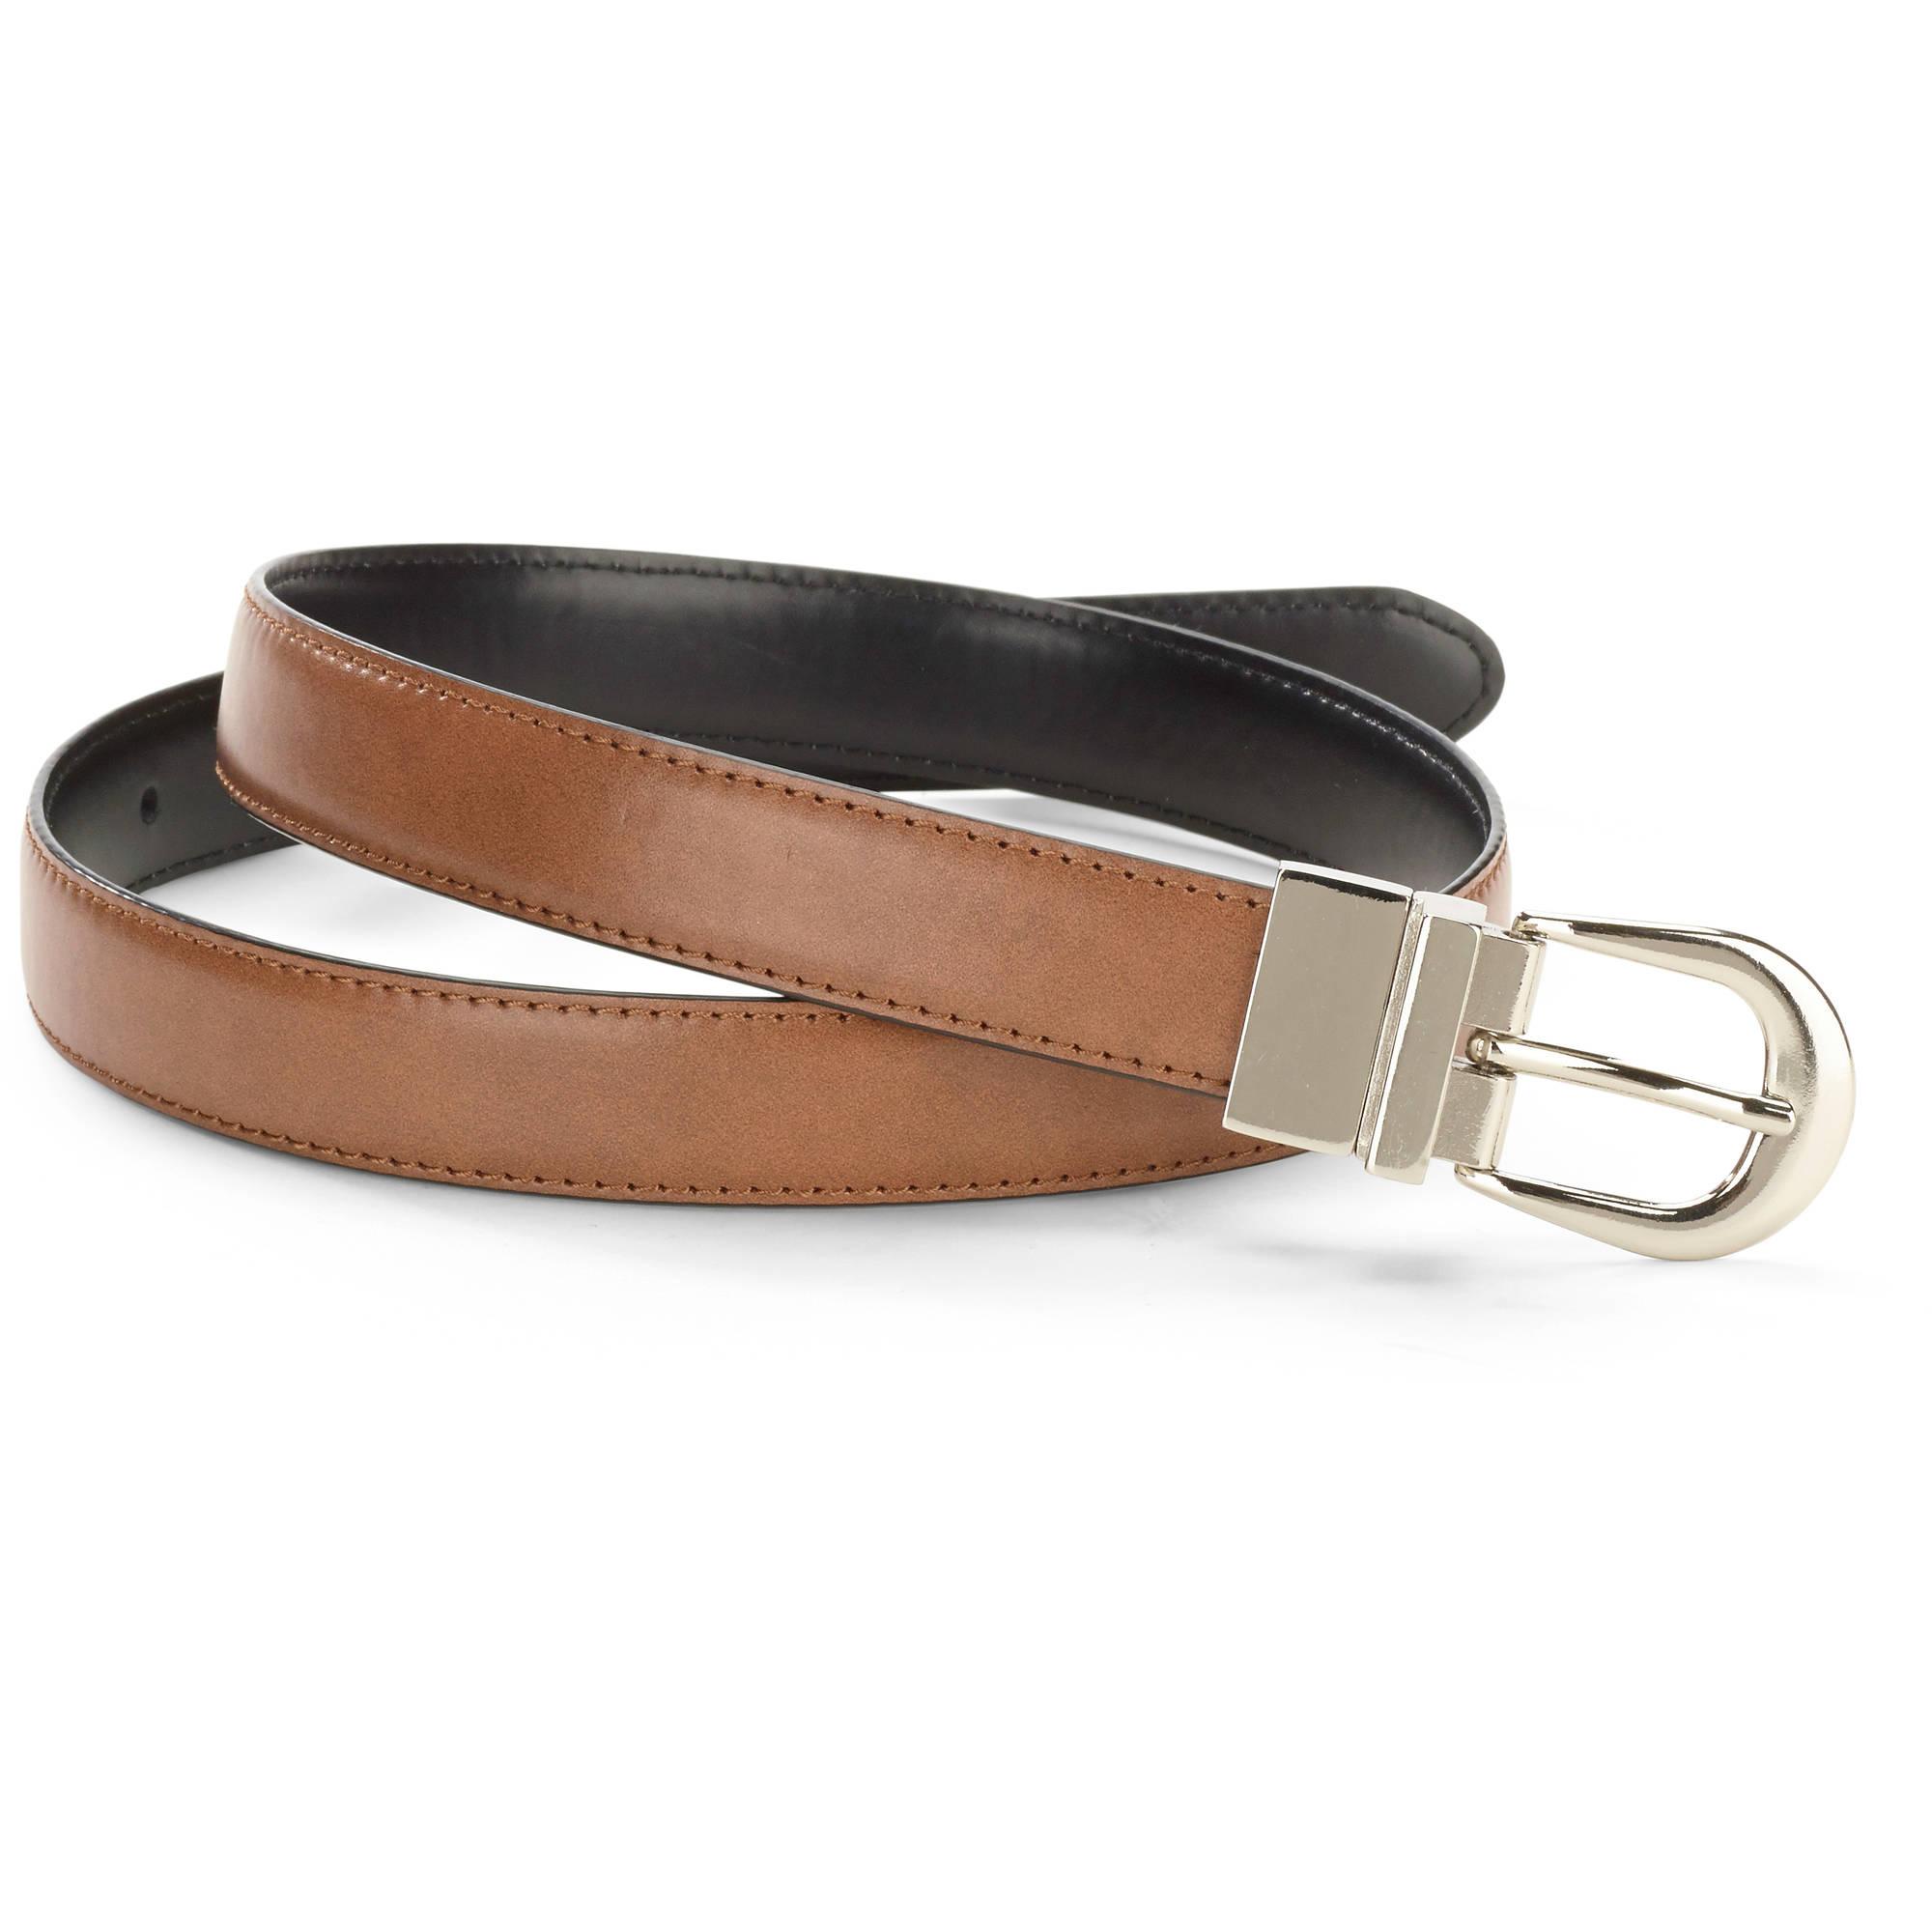 George Women's Reversible Belt